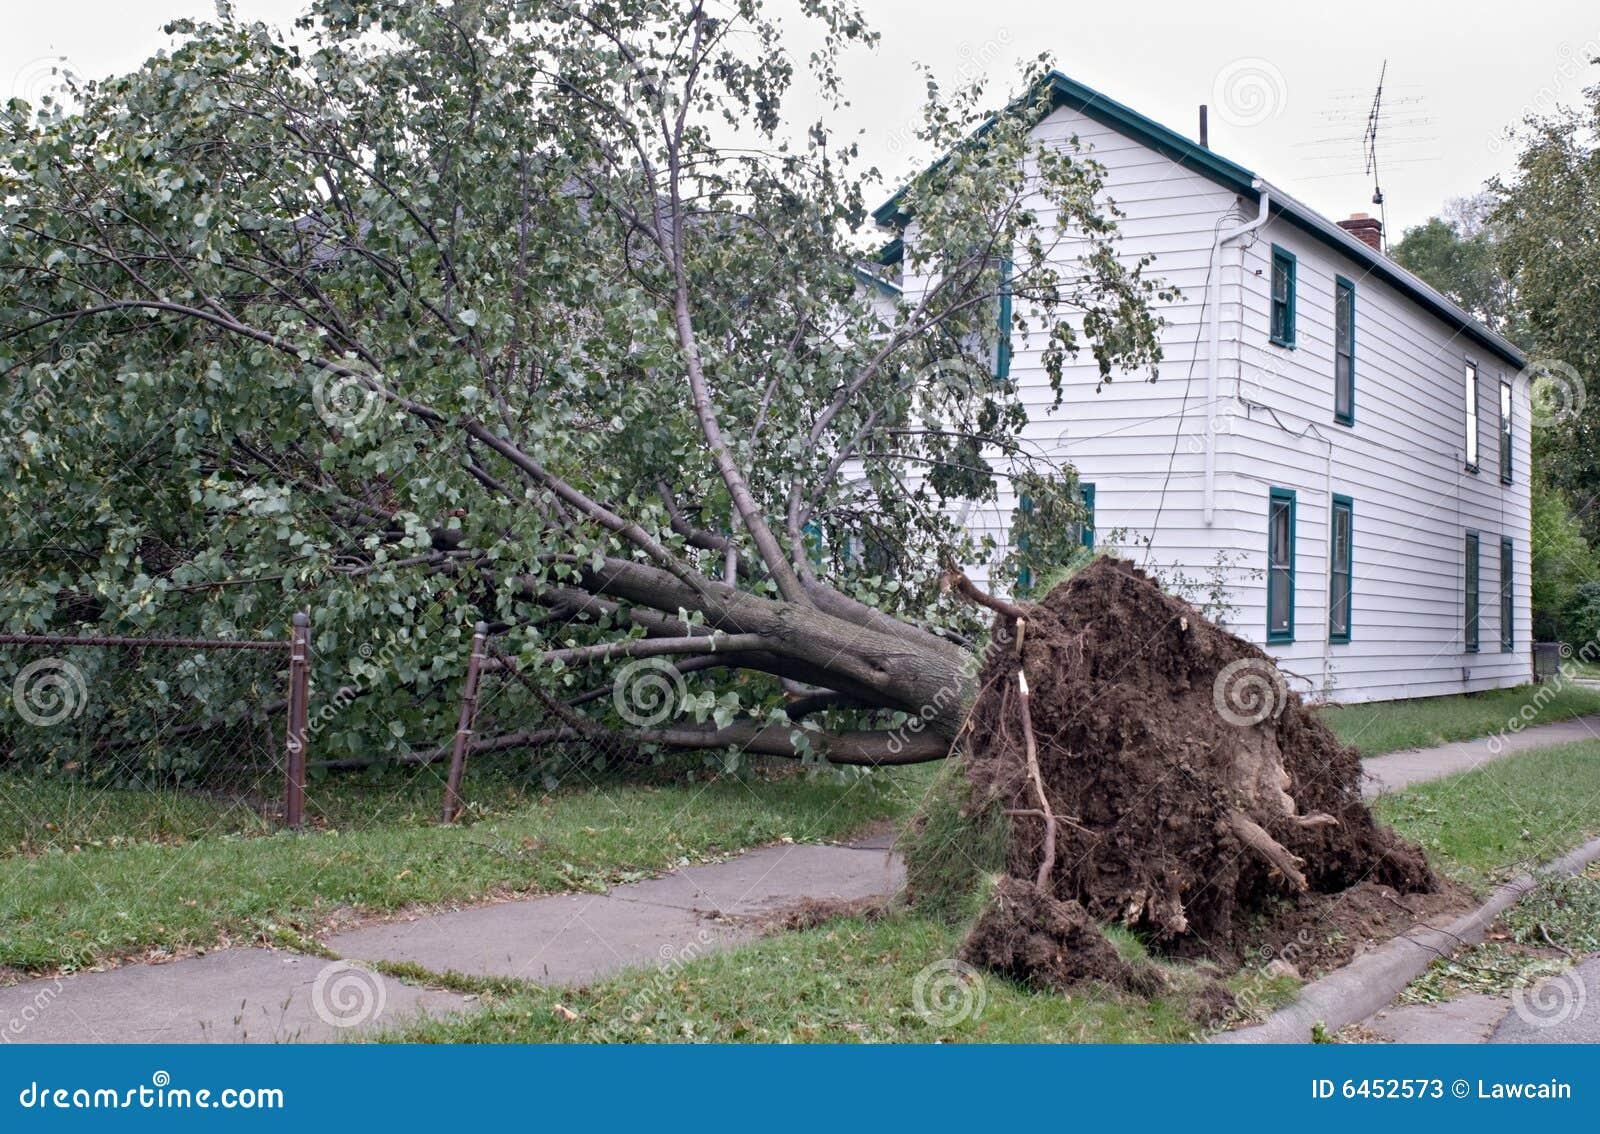 Desarraigado después de tormenta